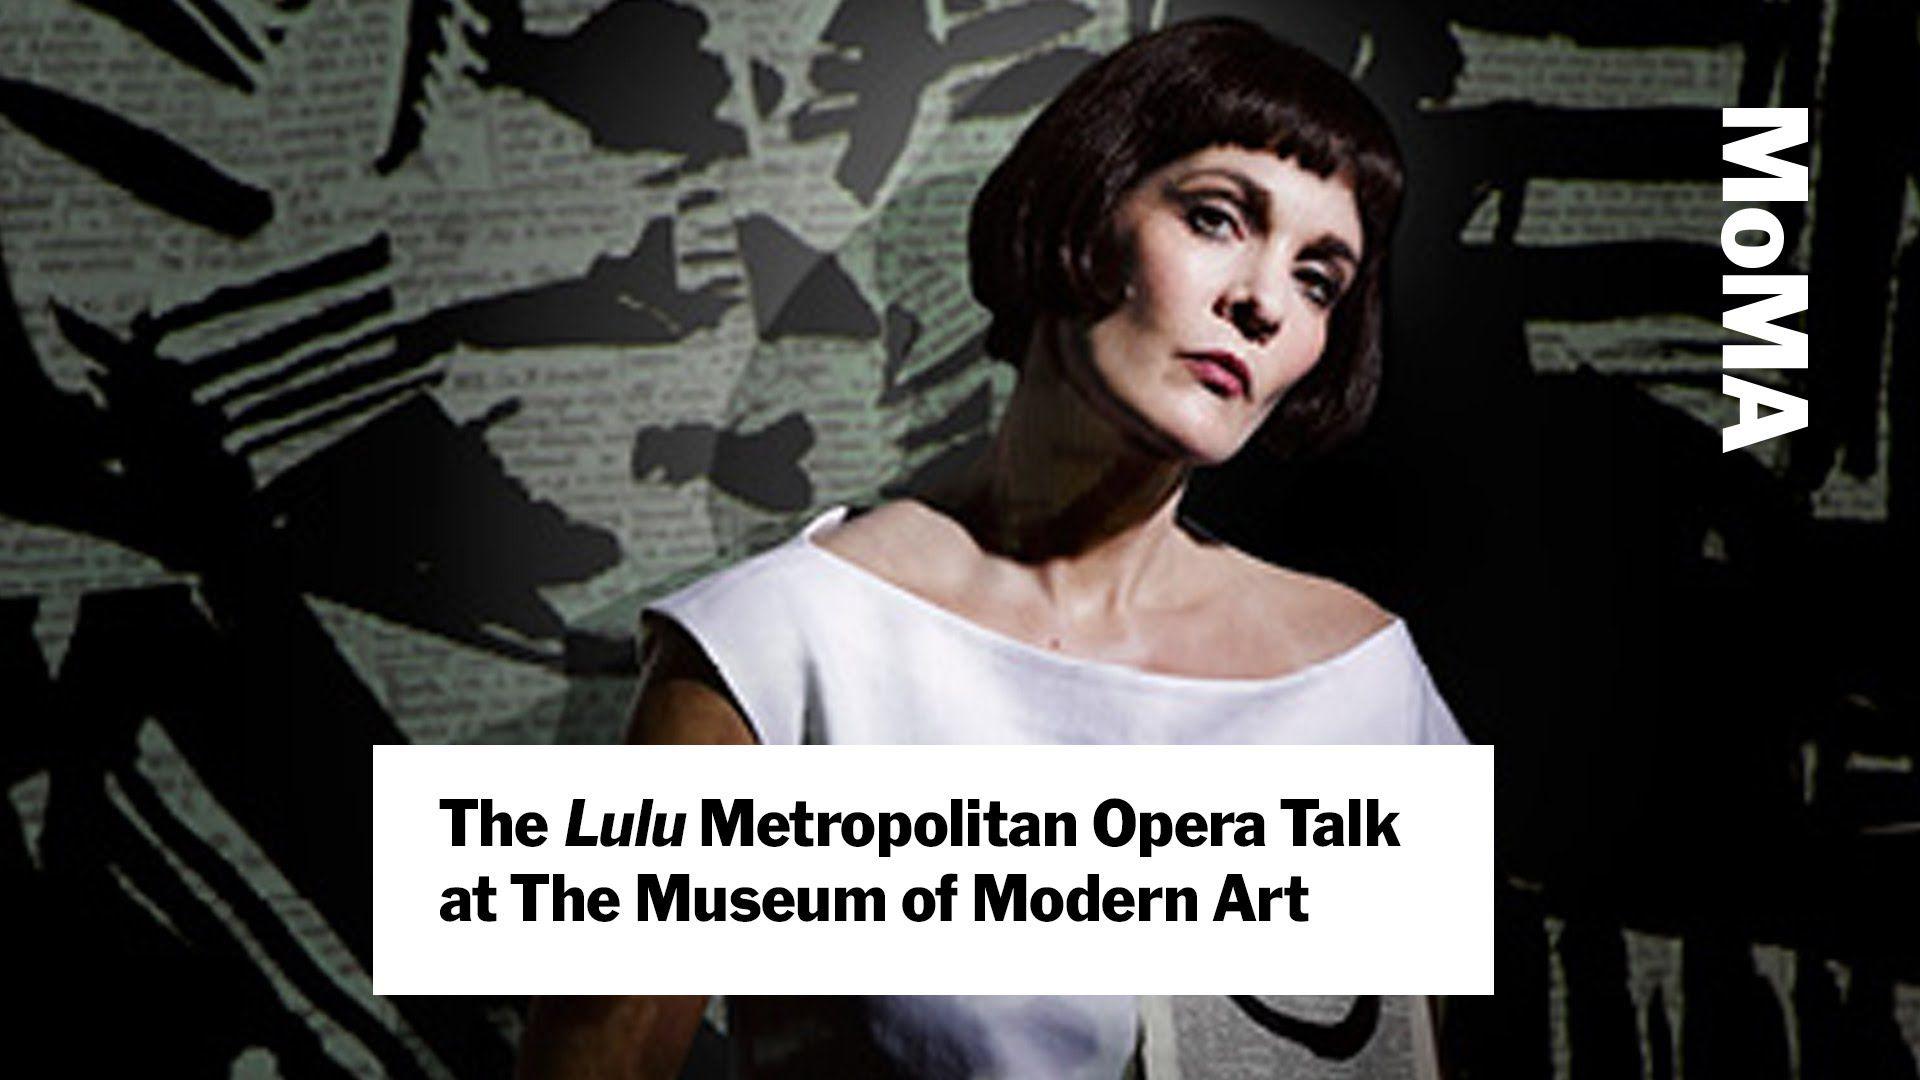 Lulu, Berg (Met Opera) - Monoritmica: Nun